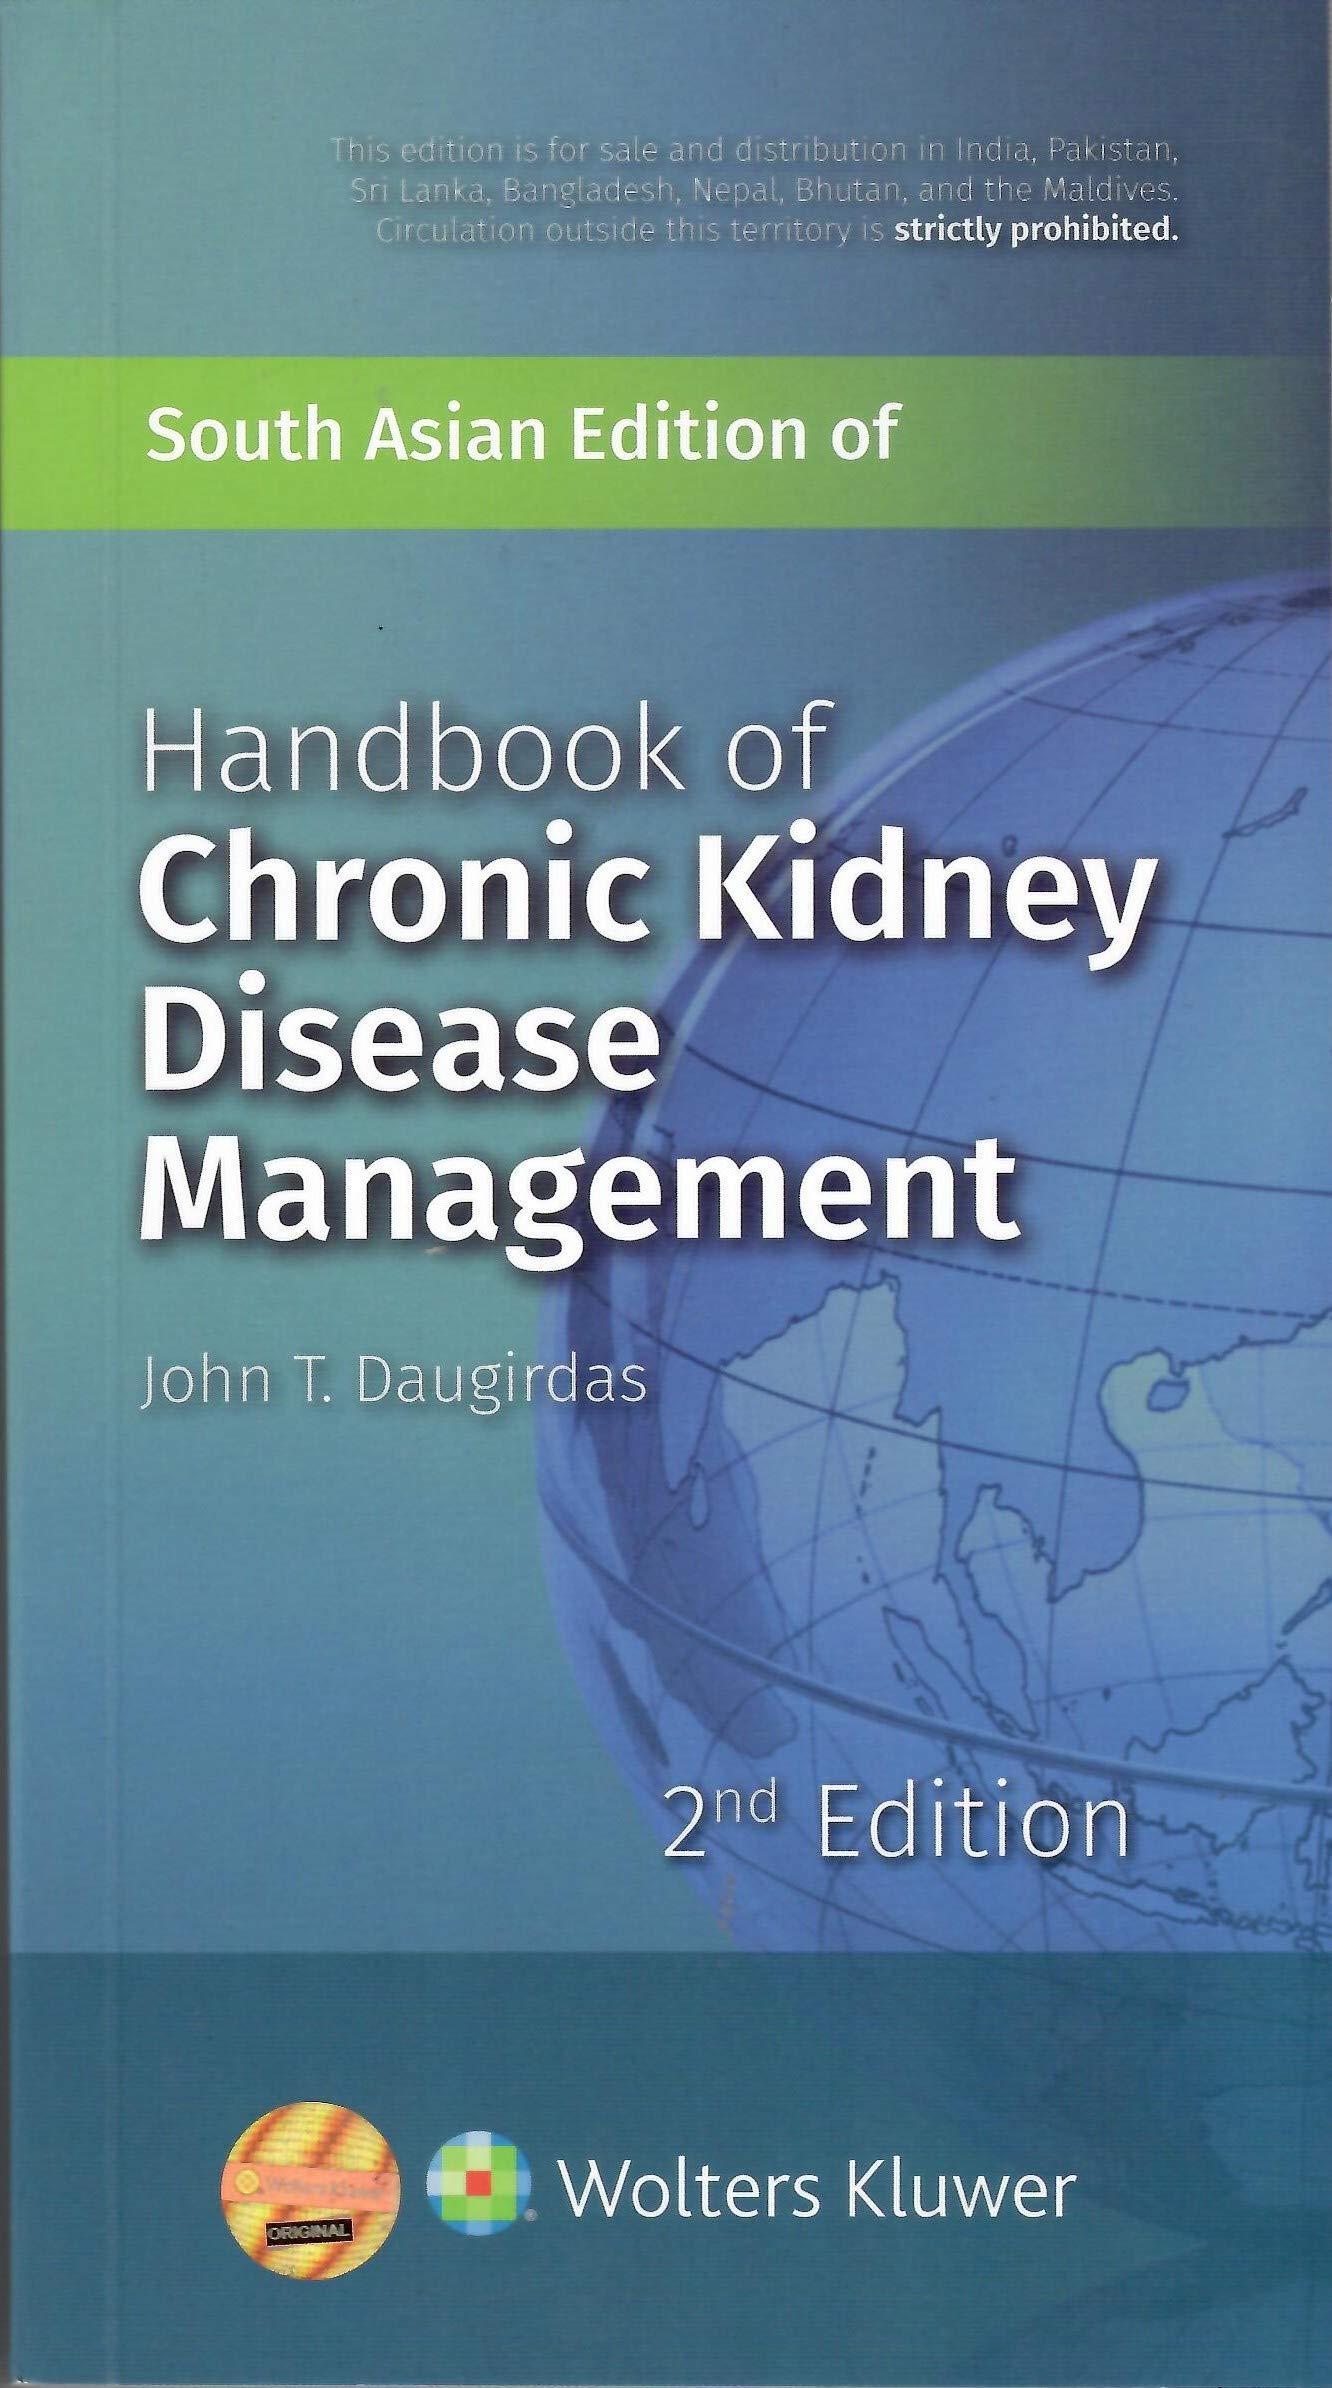 Buy Handbook Of Chronic Kidney Disease Management Book Online At Low Prices In India Handbook Of Chronic Kidney Disease Management Reviews Ratings Amazon In